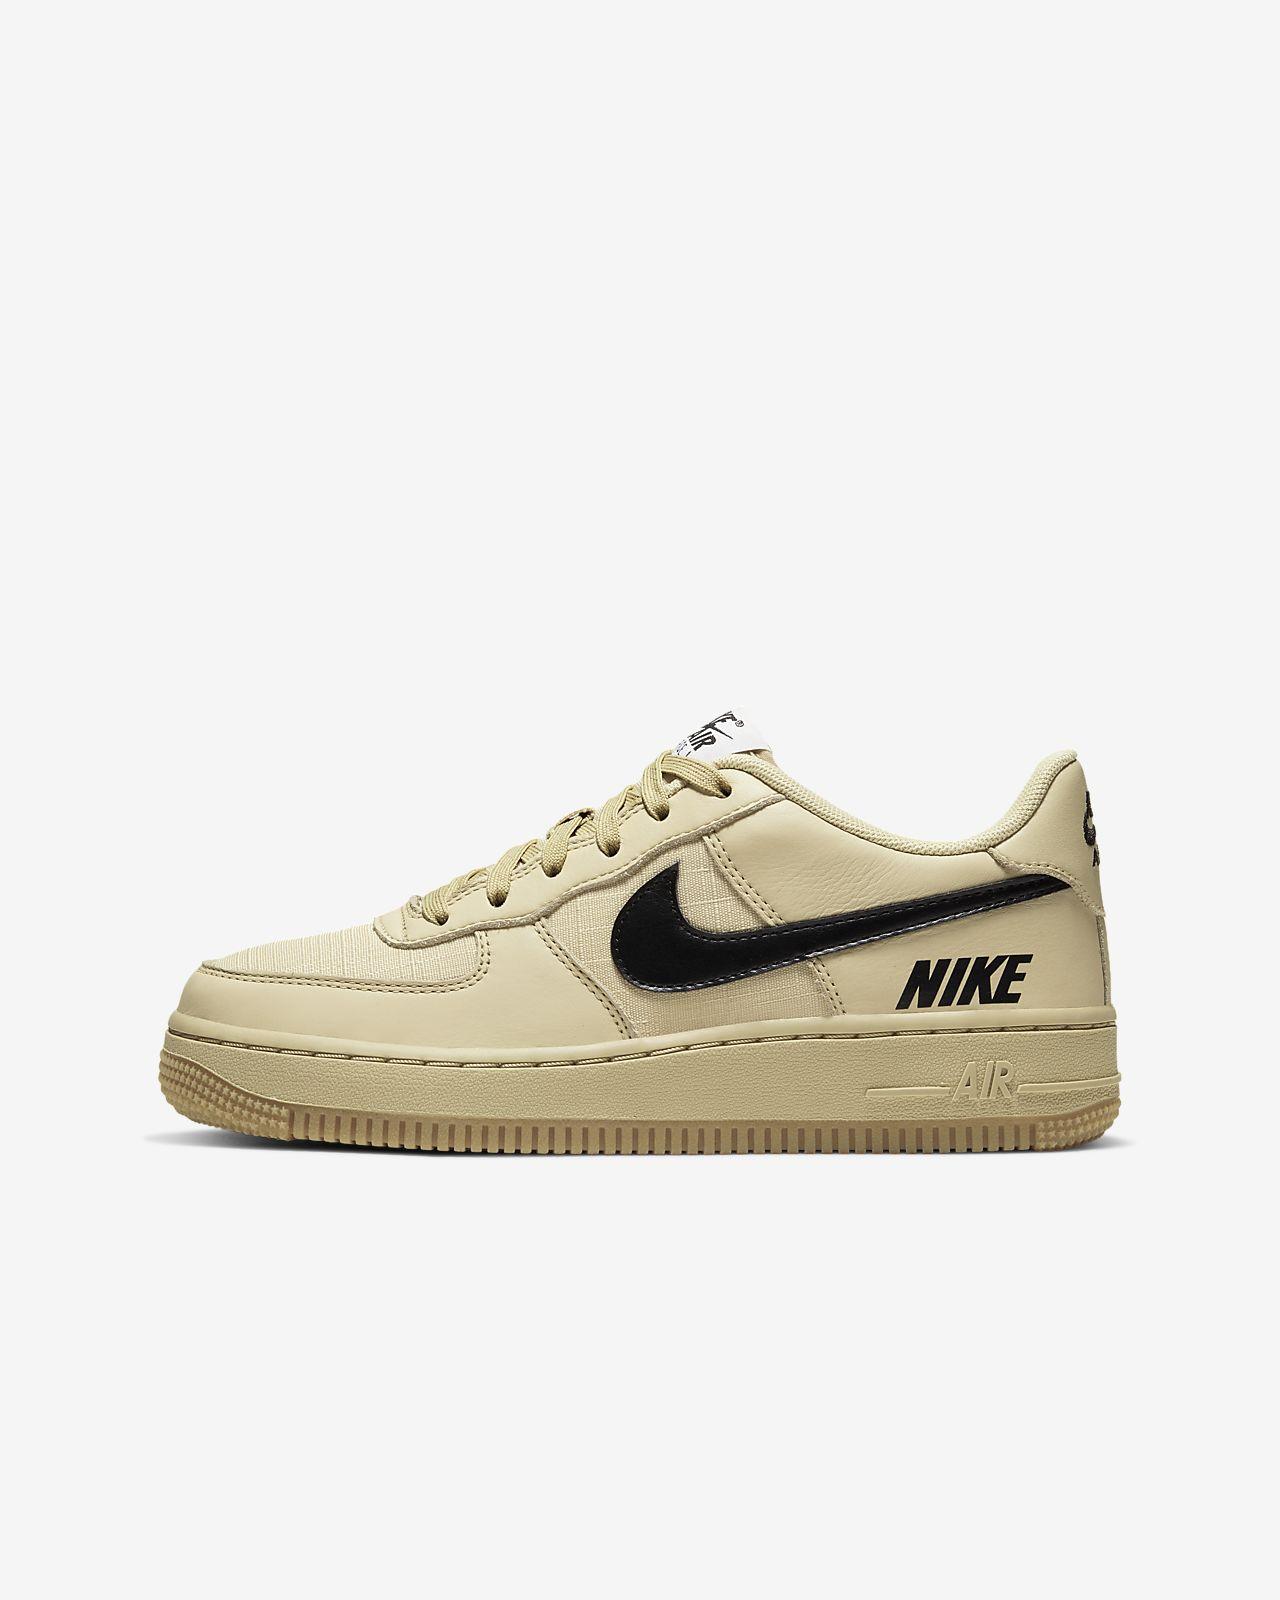 Nike Air Force 1 LV8 5 Schuh für ältere Kinder